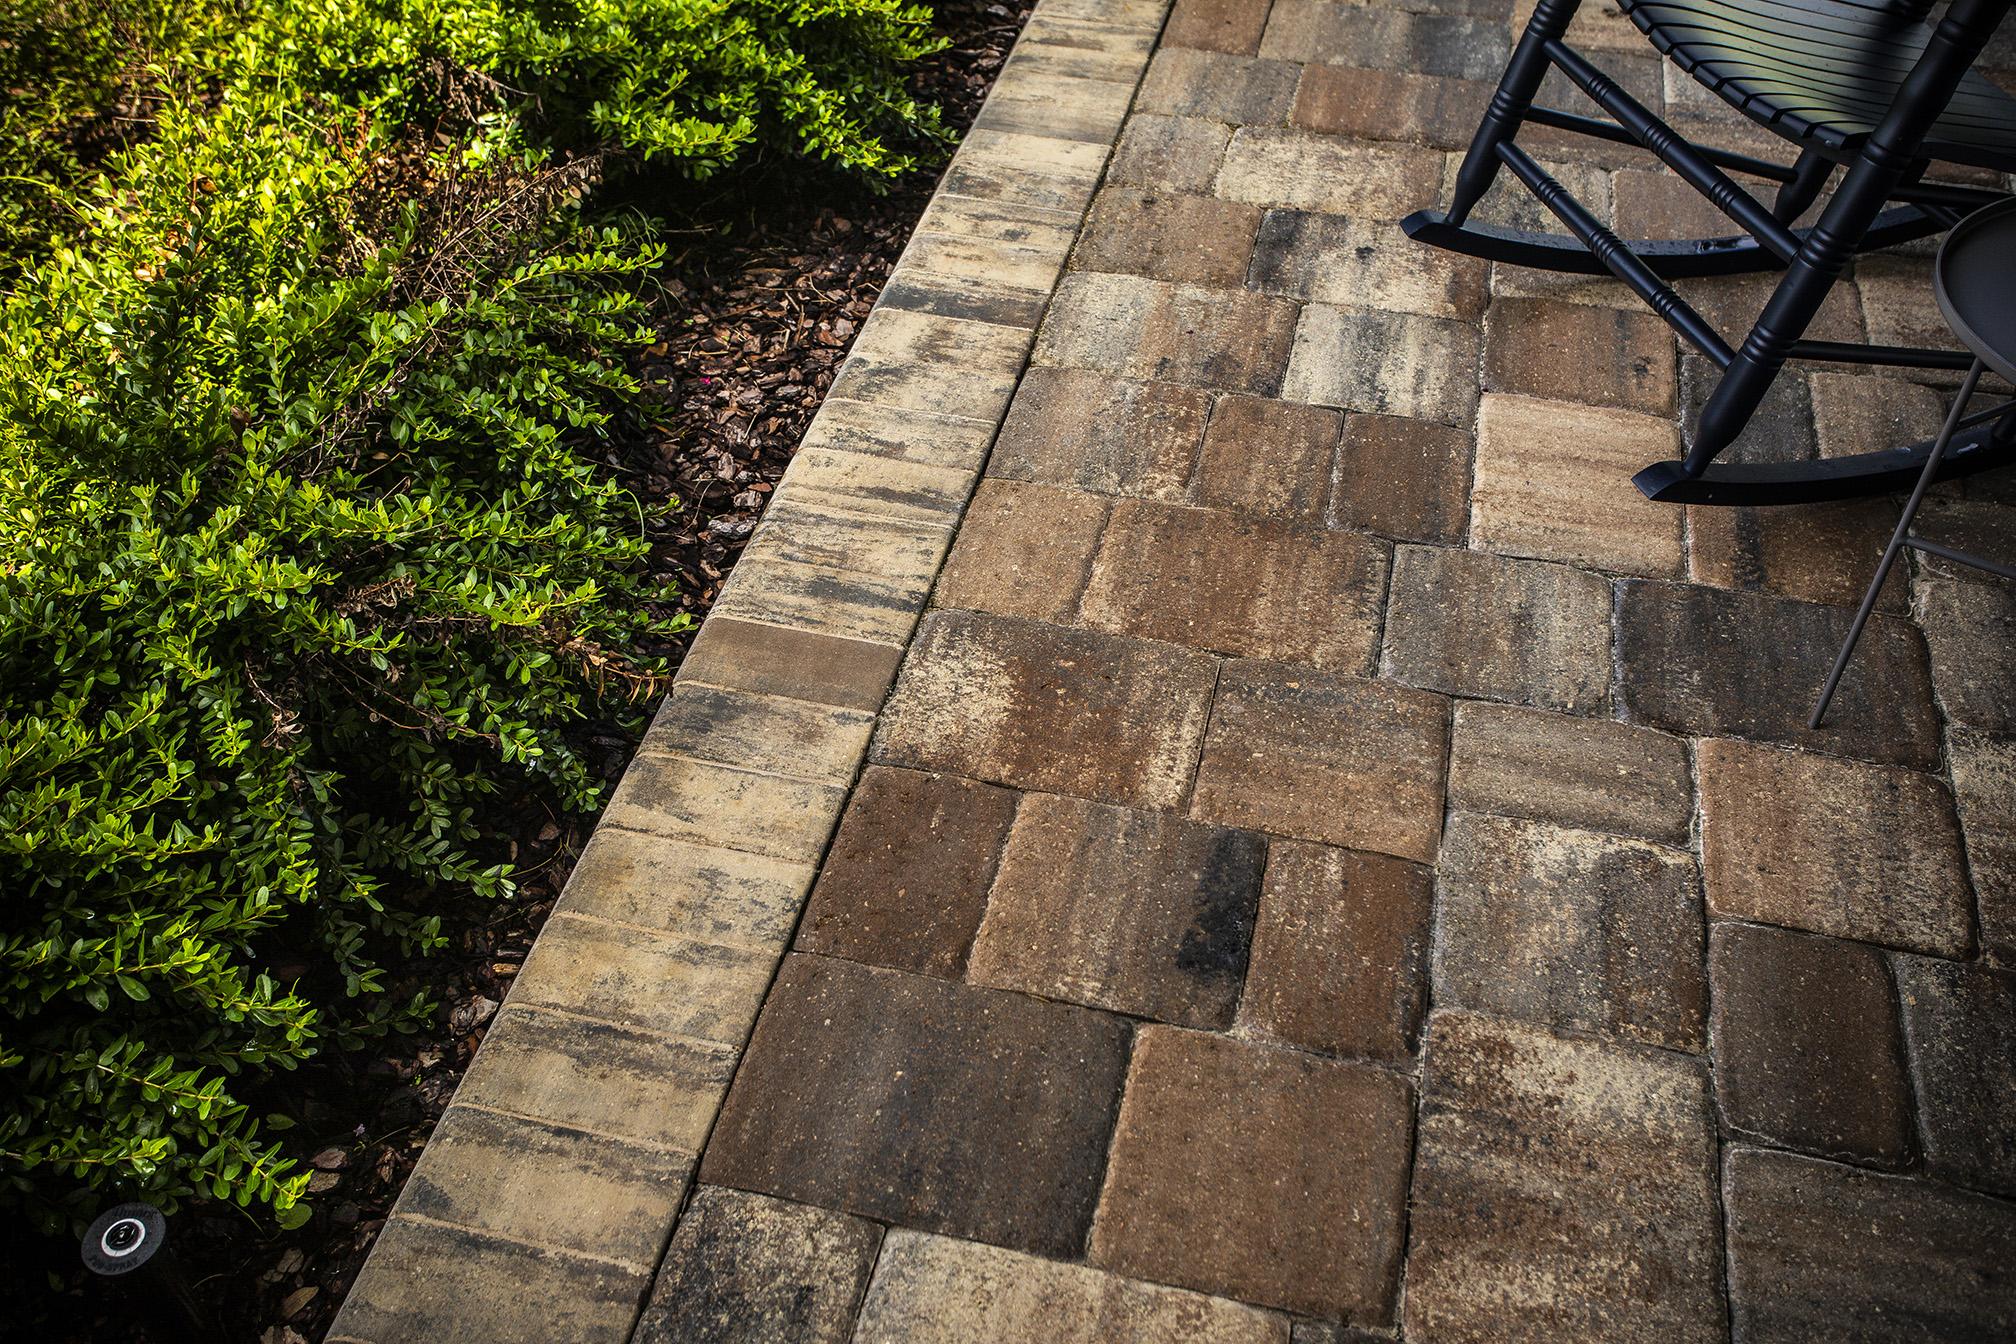 paver patios considering materials